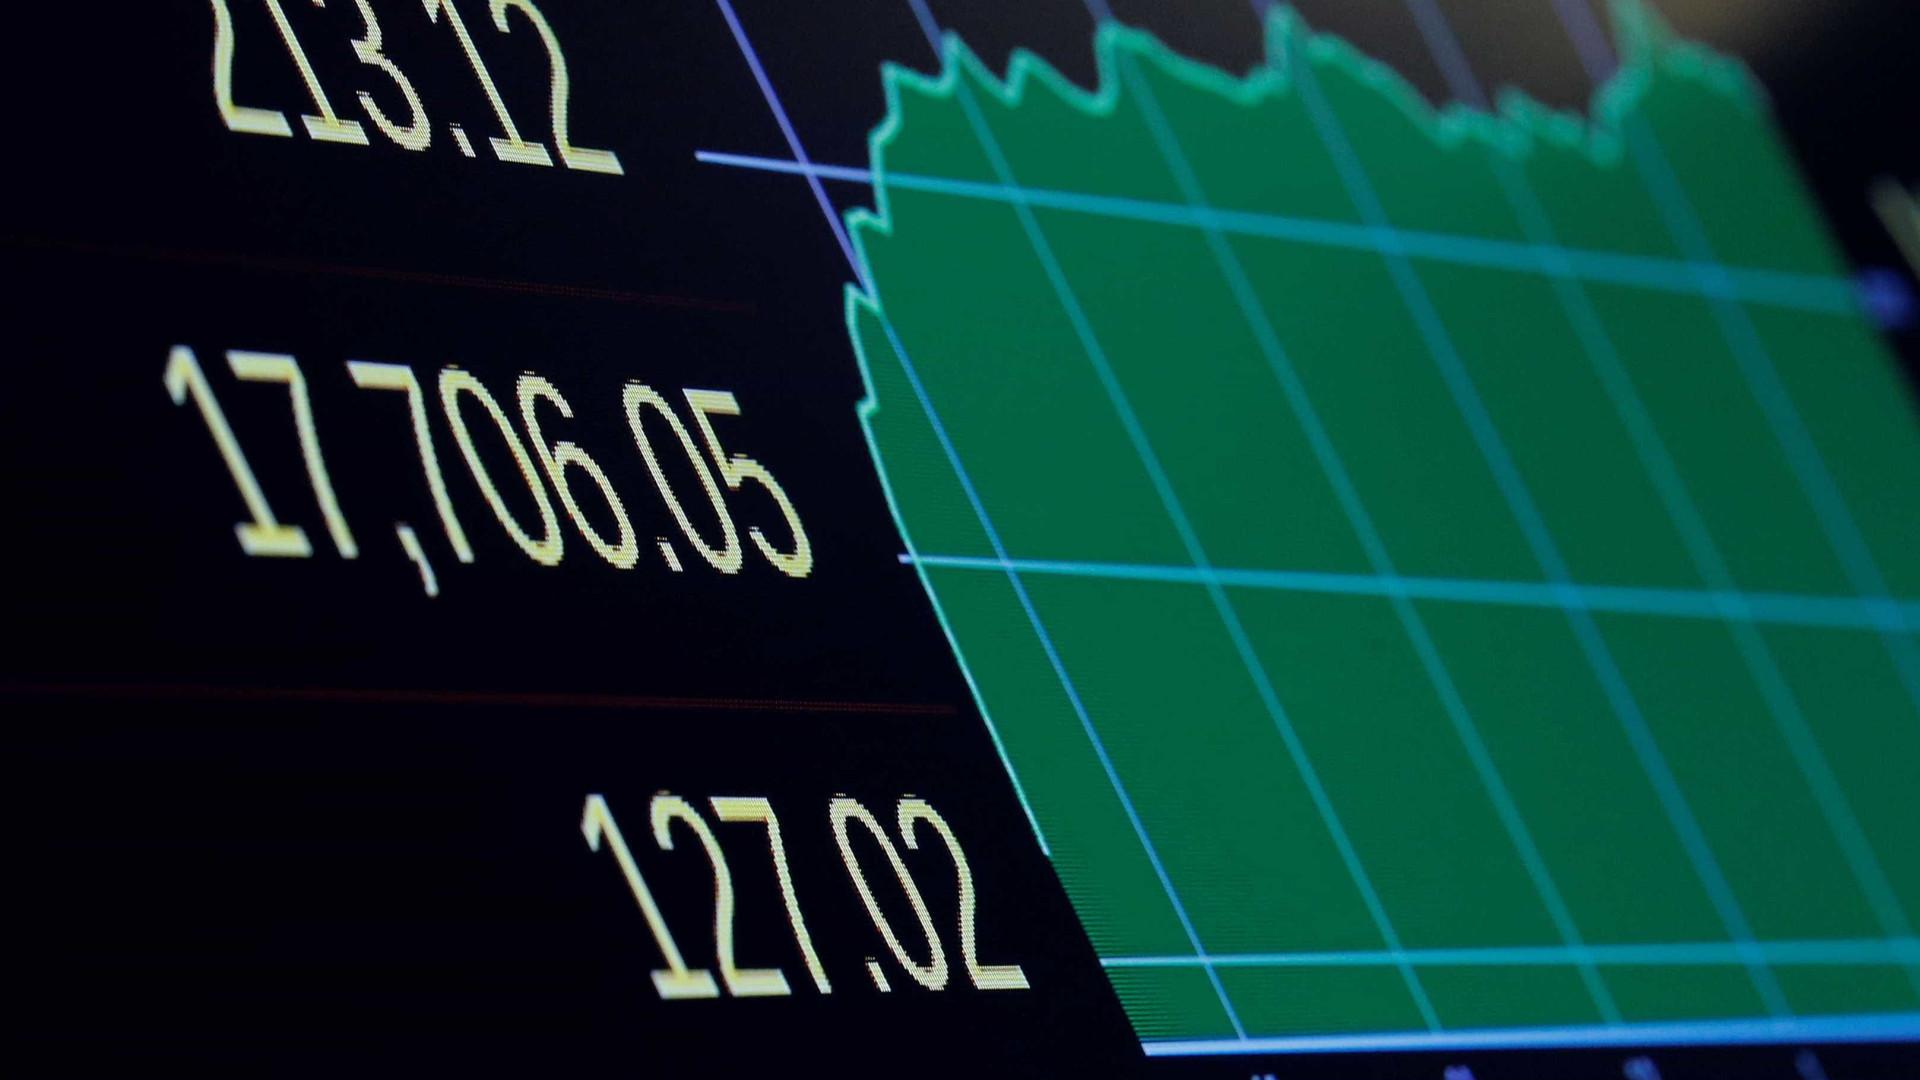 Bolsa de Nova Iorque encerra em terreno misto. Dow Jones regista queda